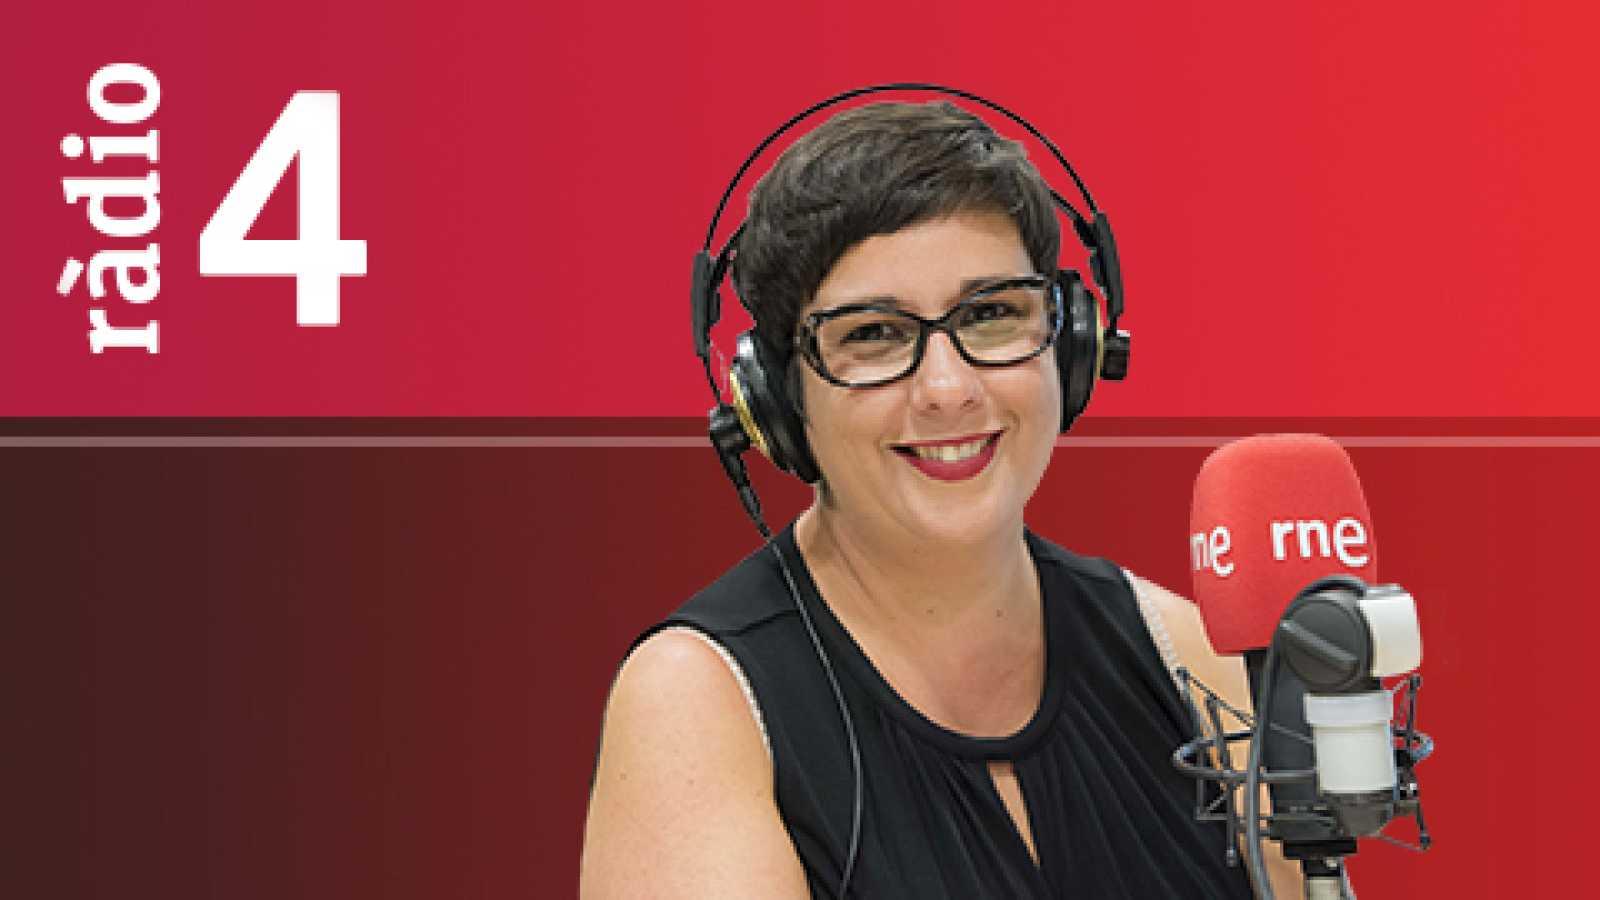 Realpolitik - Elisenda Alamany, Mar Ampurdanés, Lucas Ferro